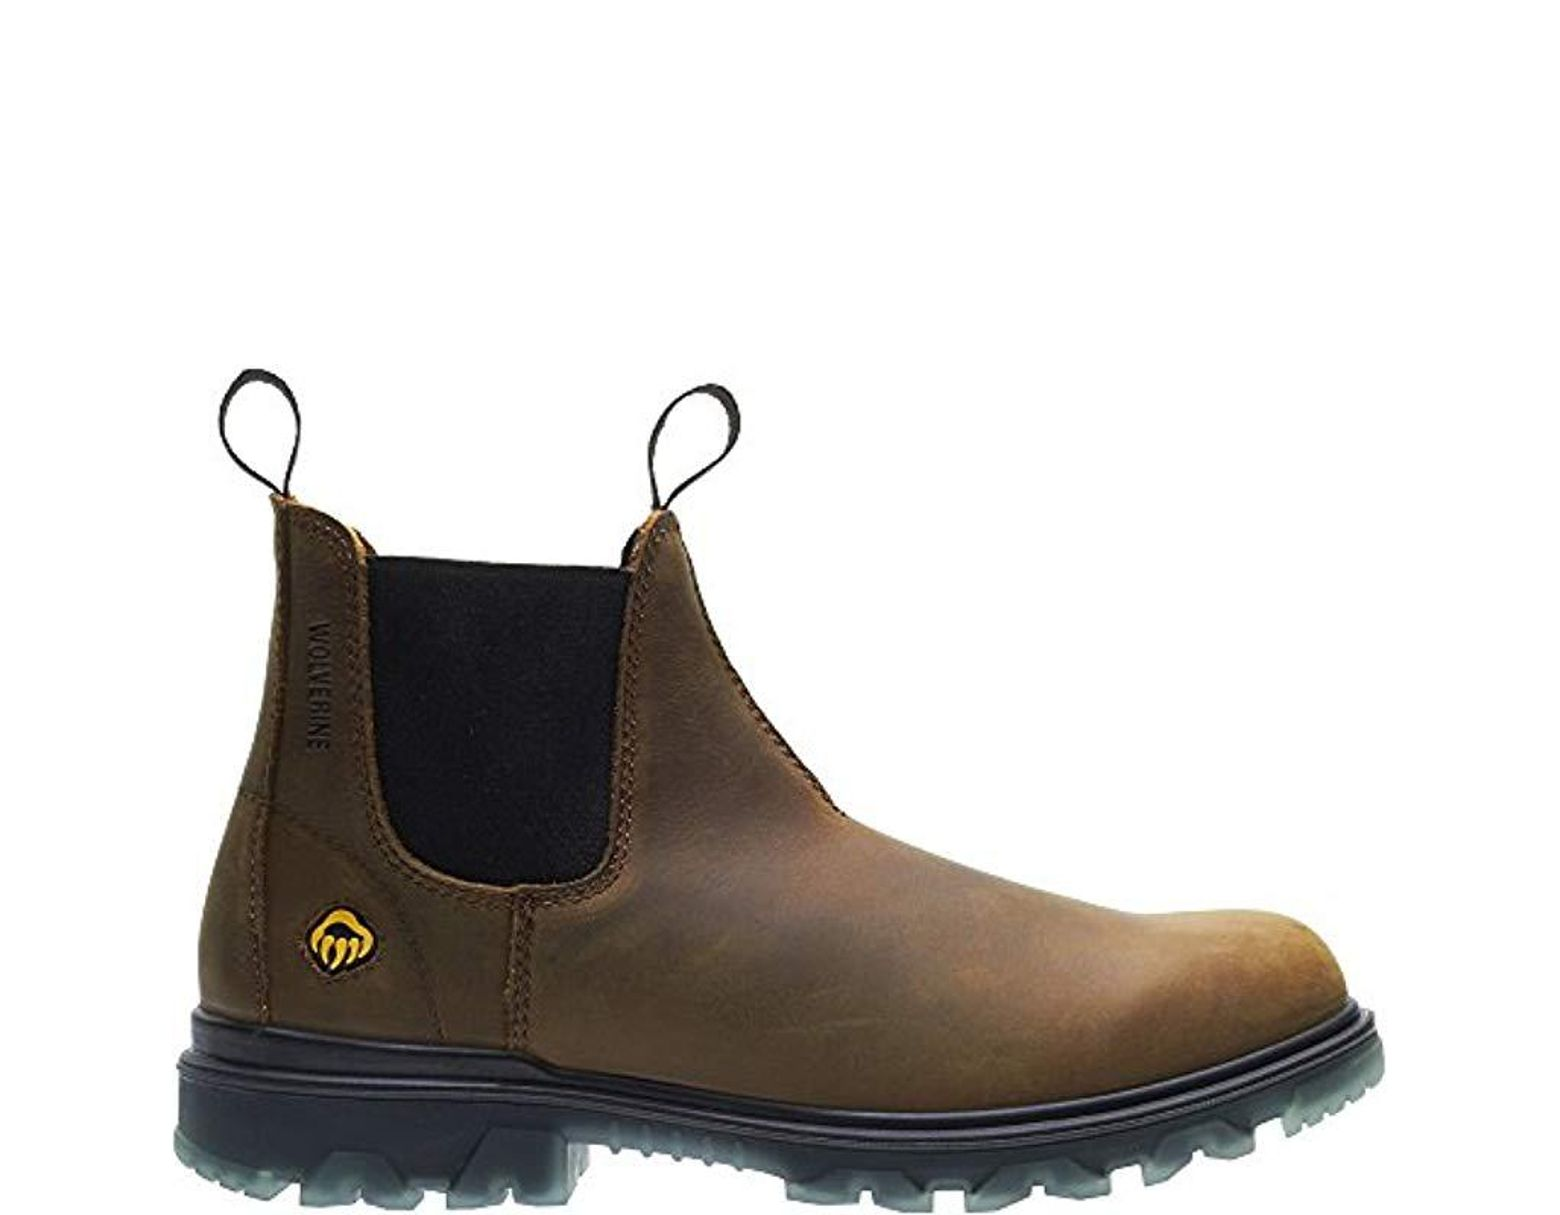 16c54080b67 Men's Brown I-90 Waterproof Soft-toe Romeo Slip-on Construction Boot